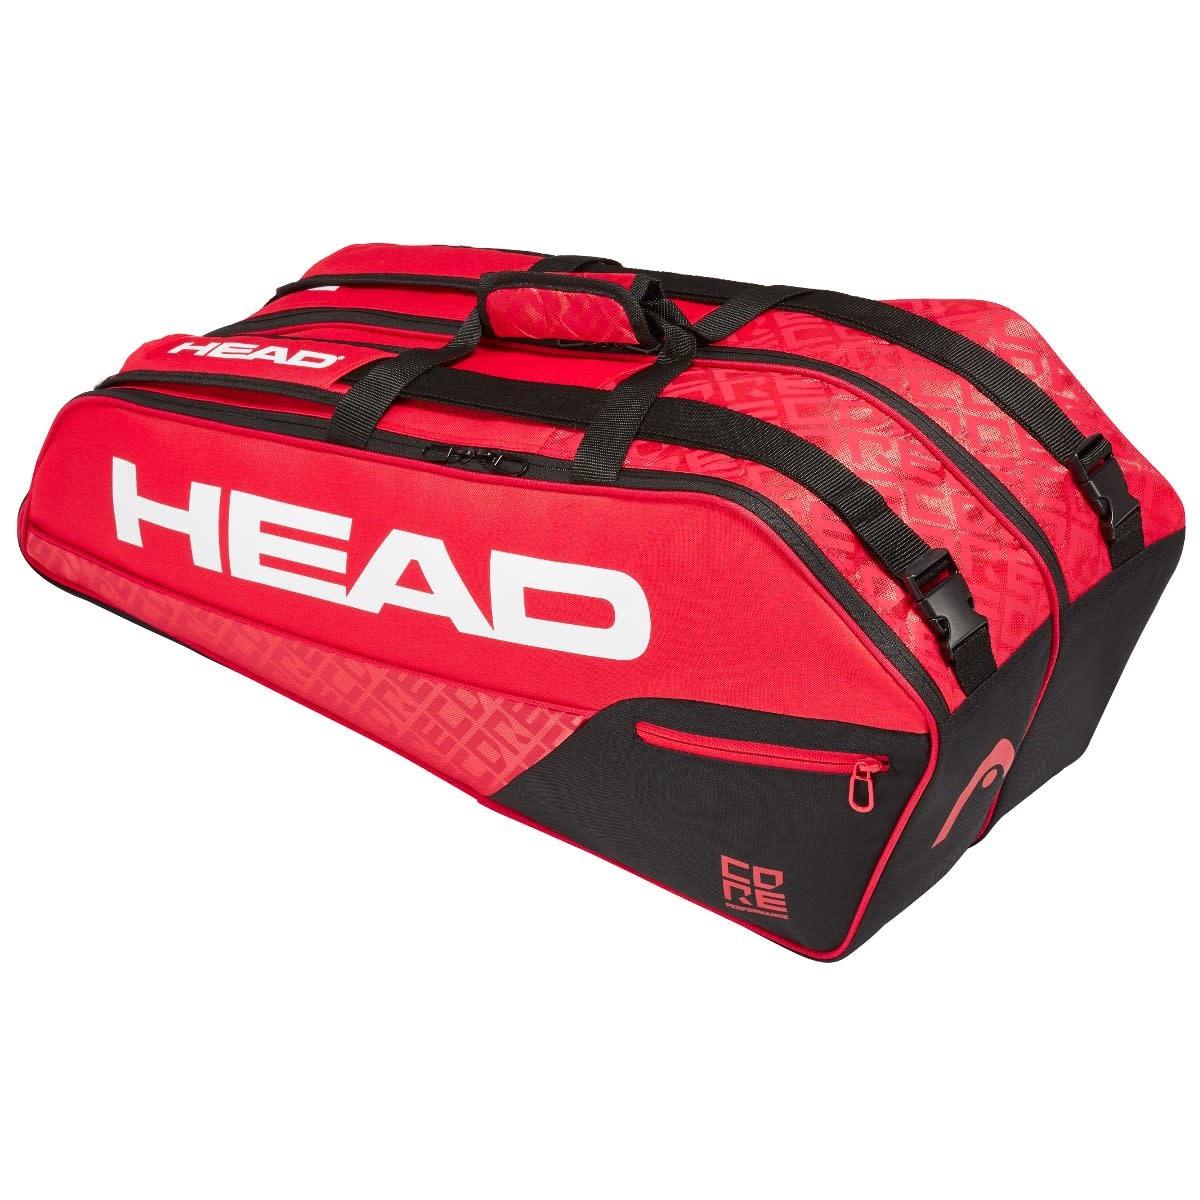 Head Core 6R Combi RDBK